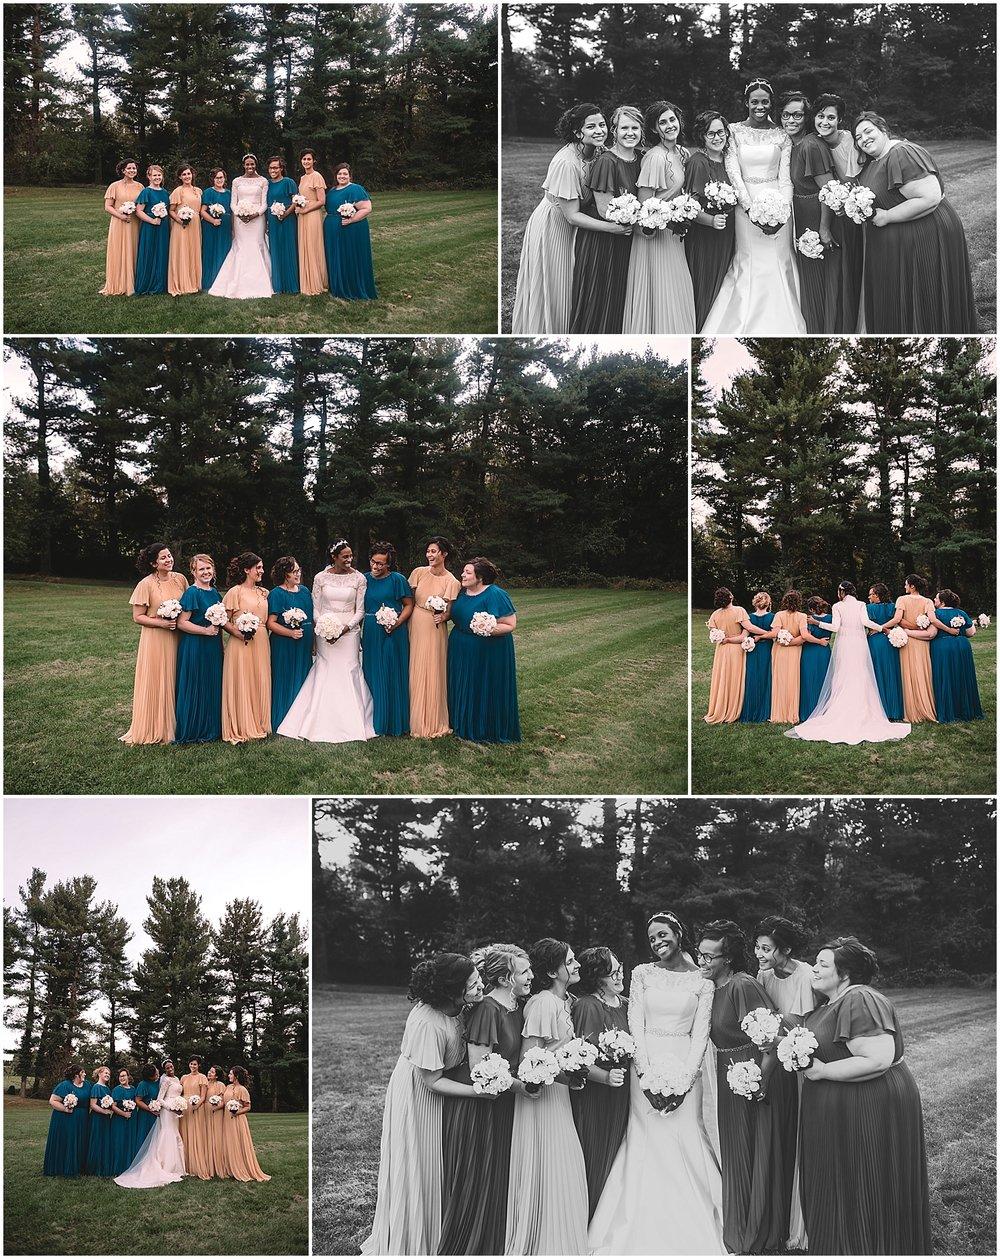 NEPA-Scranton-wedding-engagement-photographer-in-York-PA-Central-PA_0120.jpg